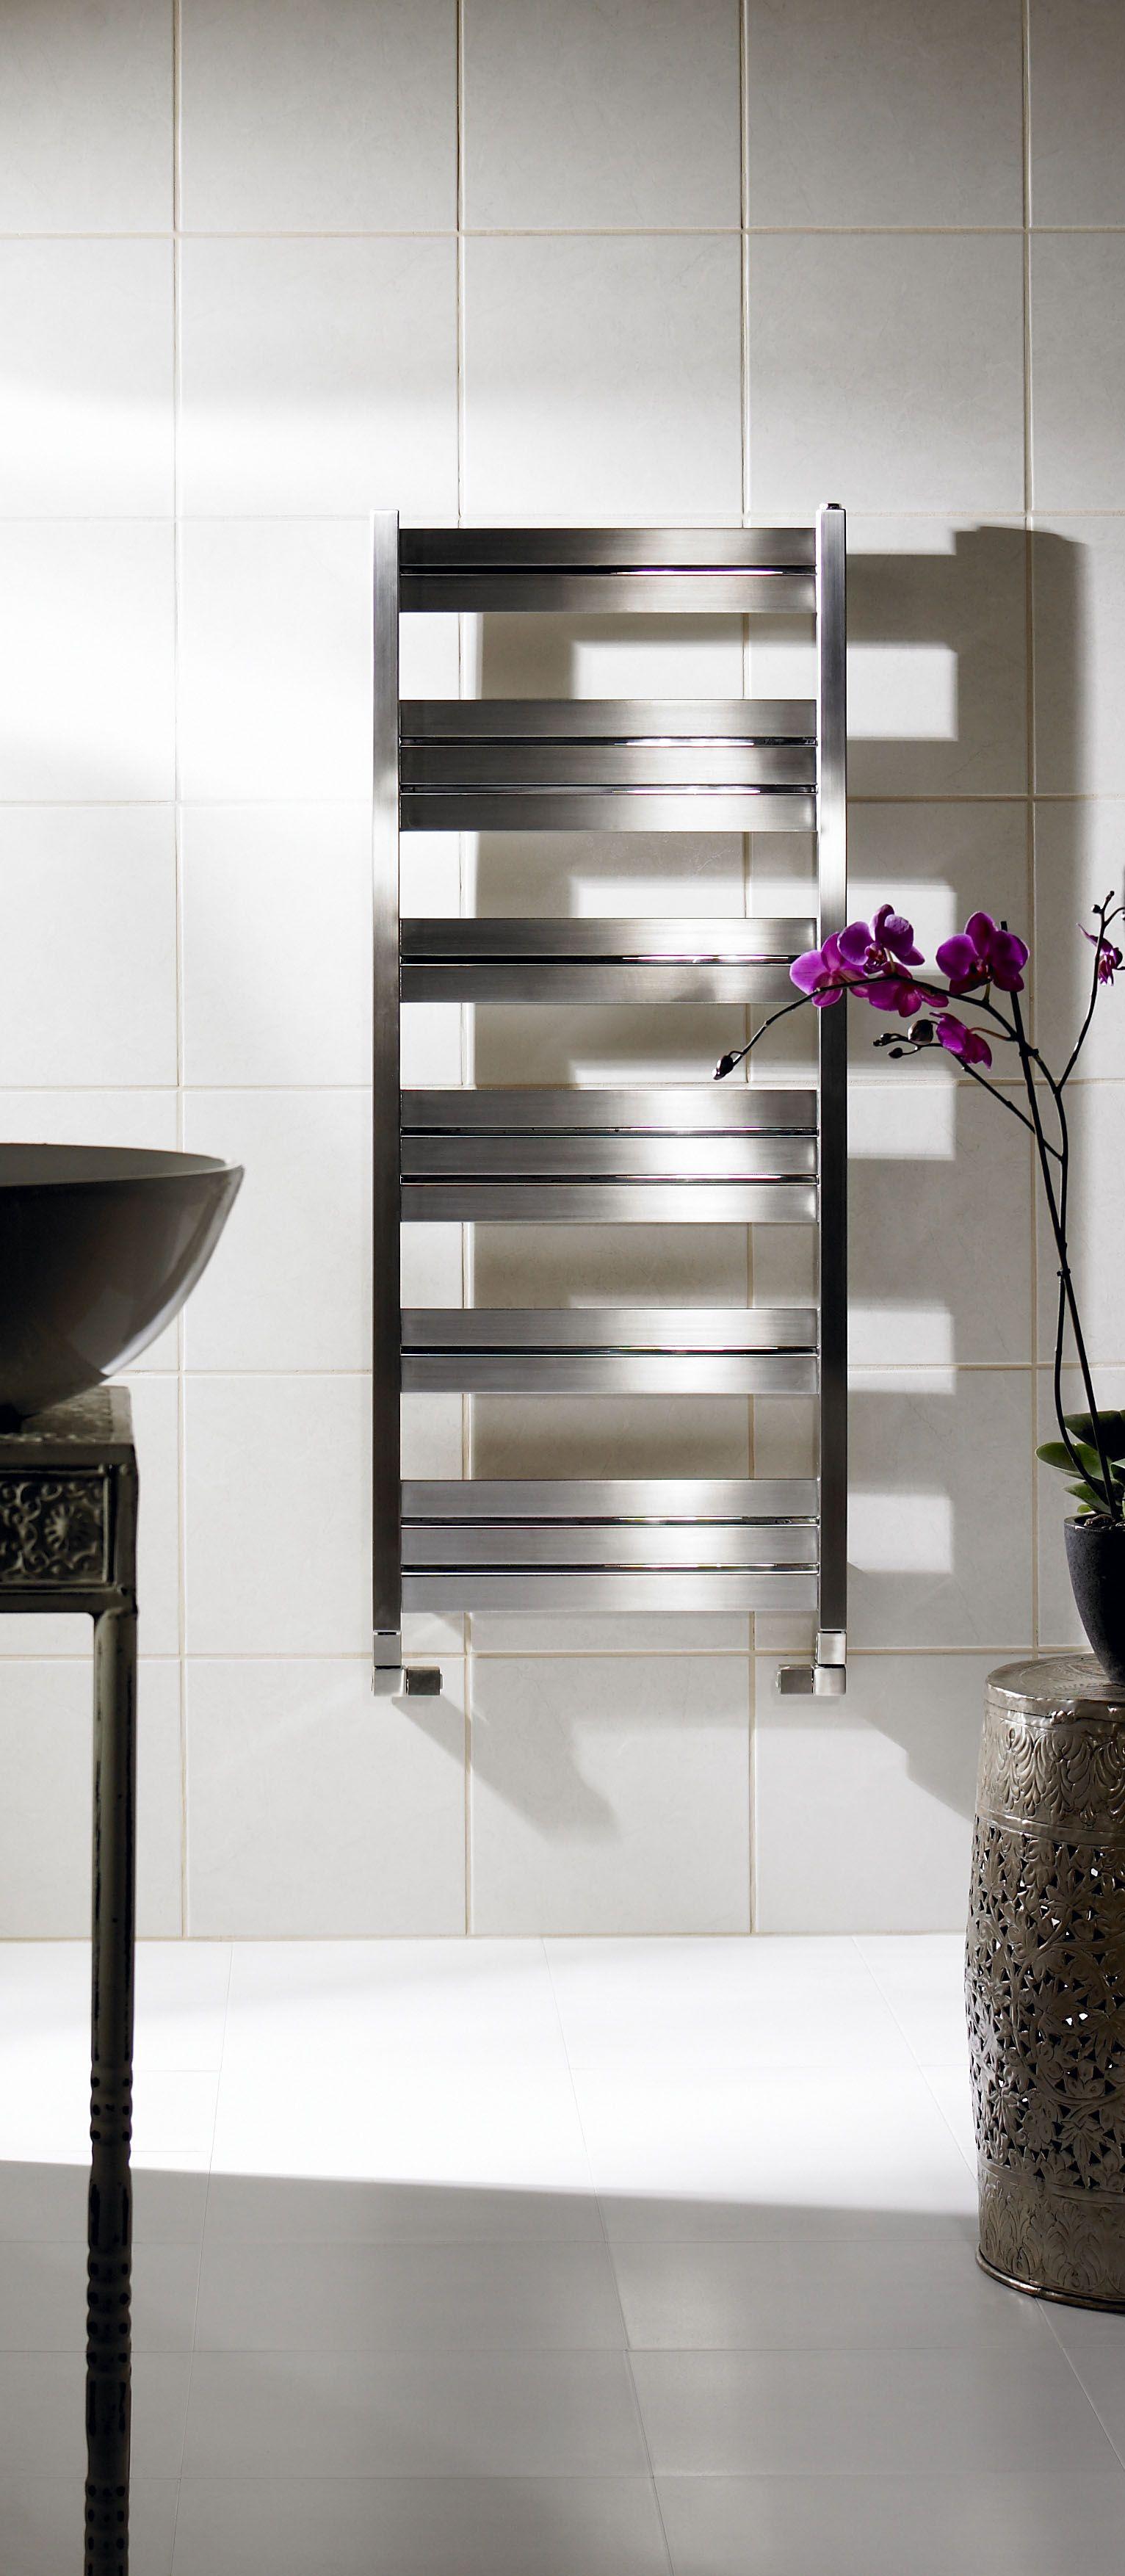 Global Bathrooms Designer Decorative Radiators And Towel Rails For Gorgeous Designer Heated Towel Rails For Bathrooms Design Inspiration